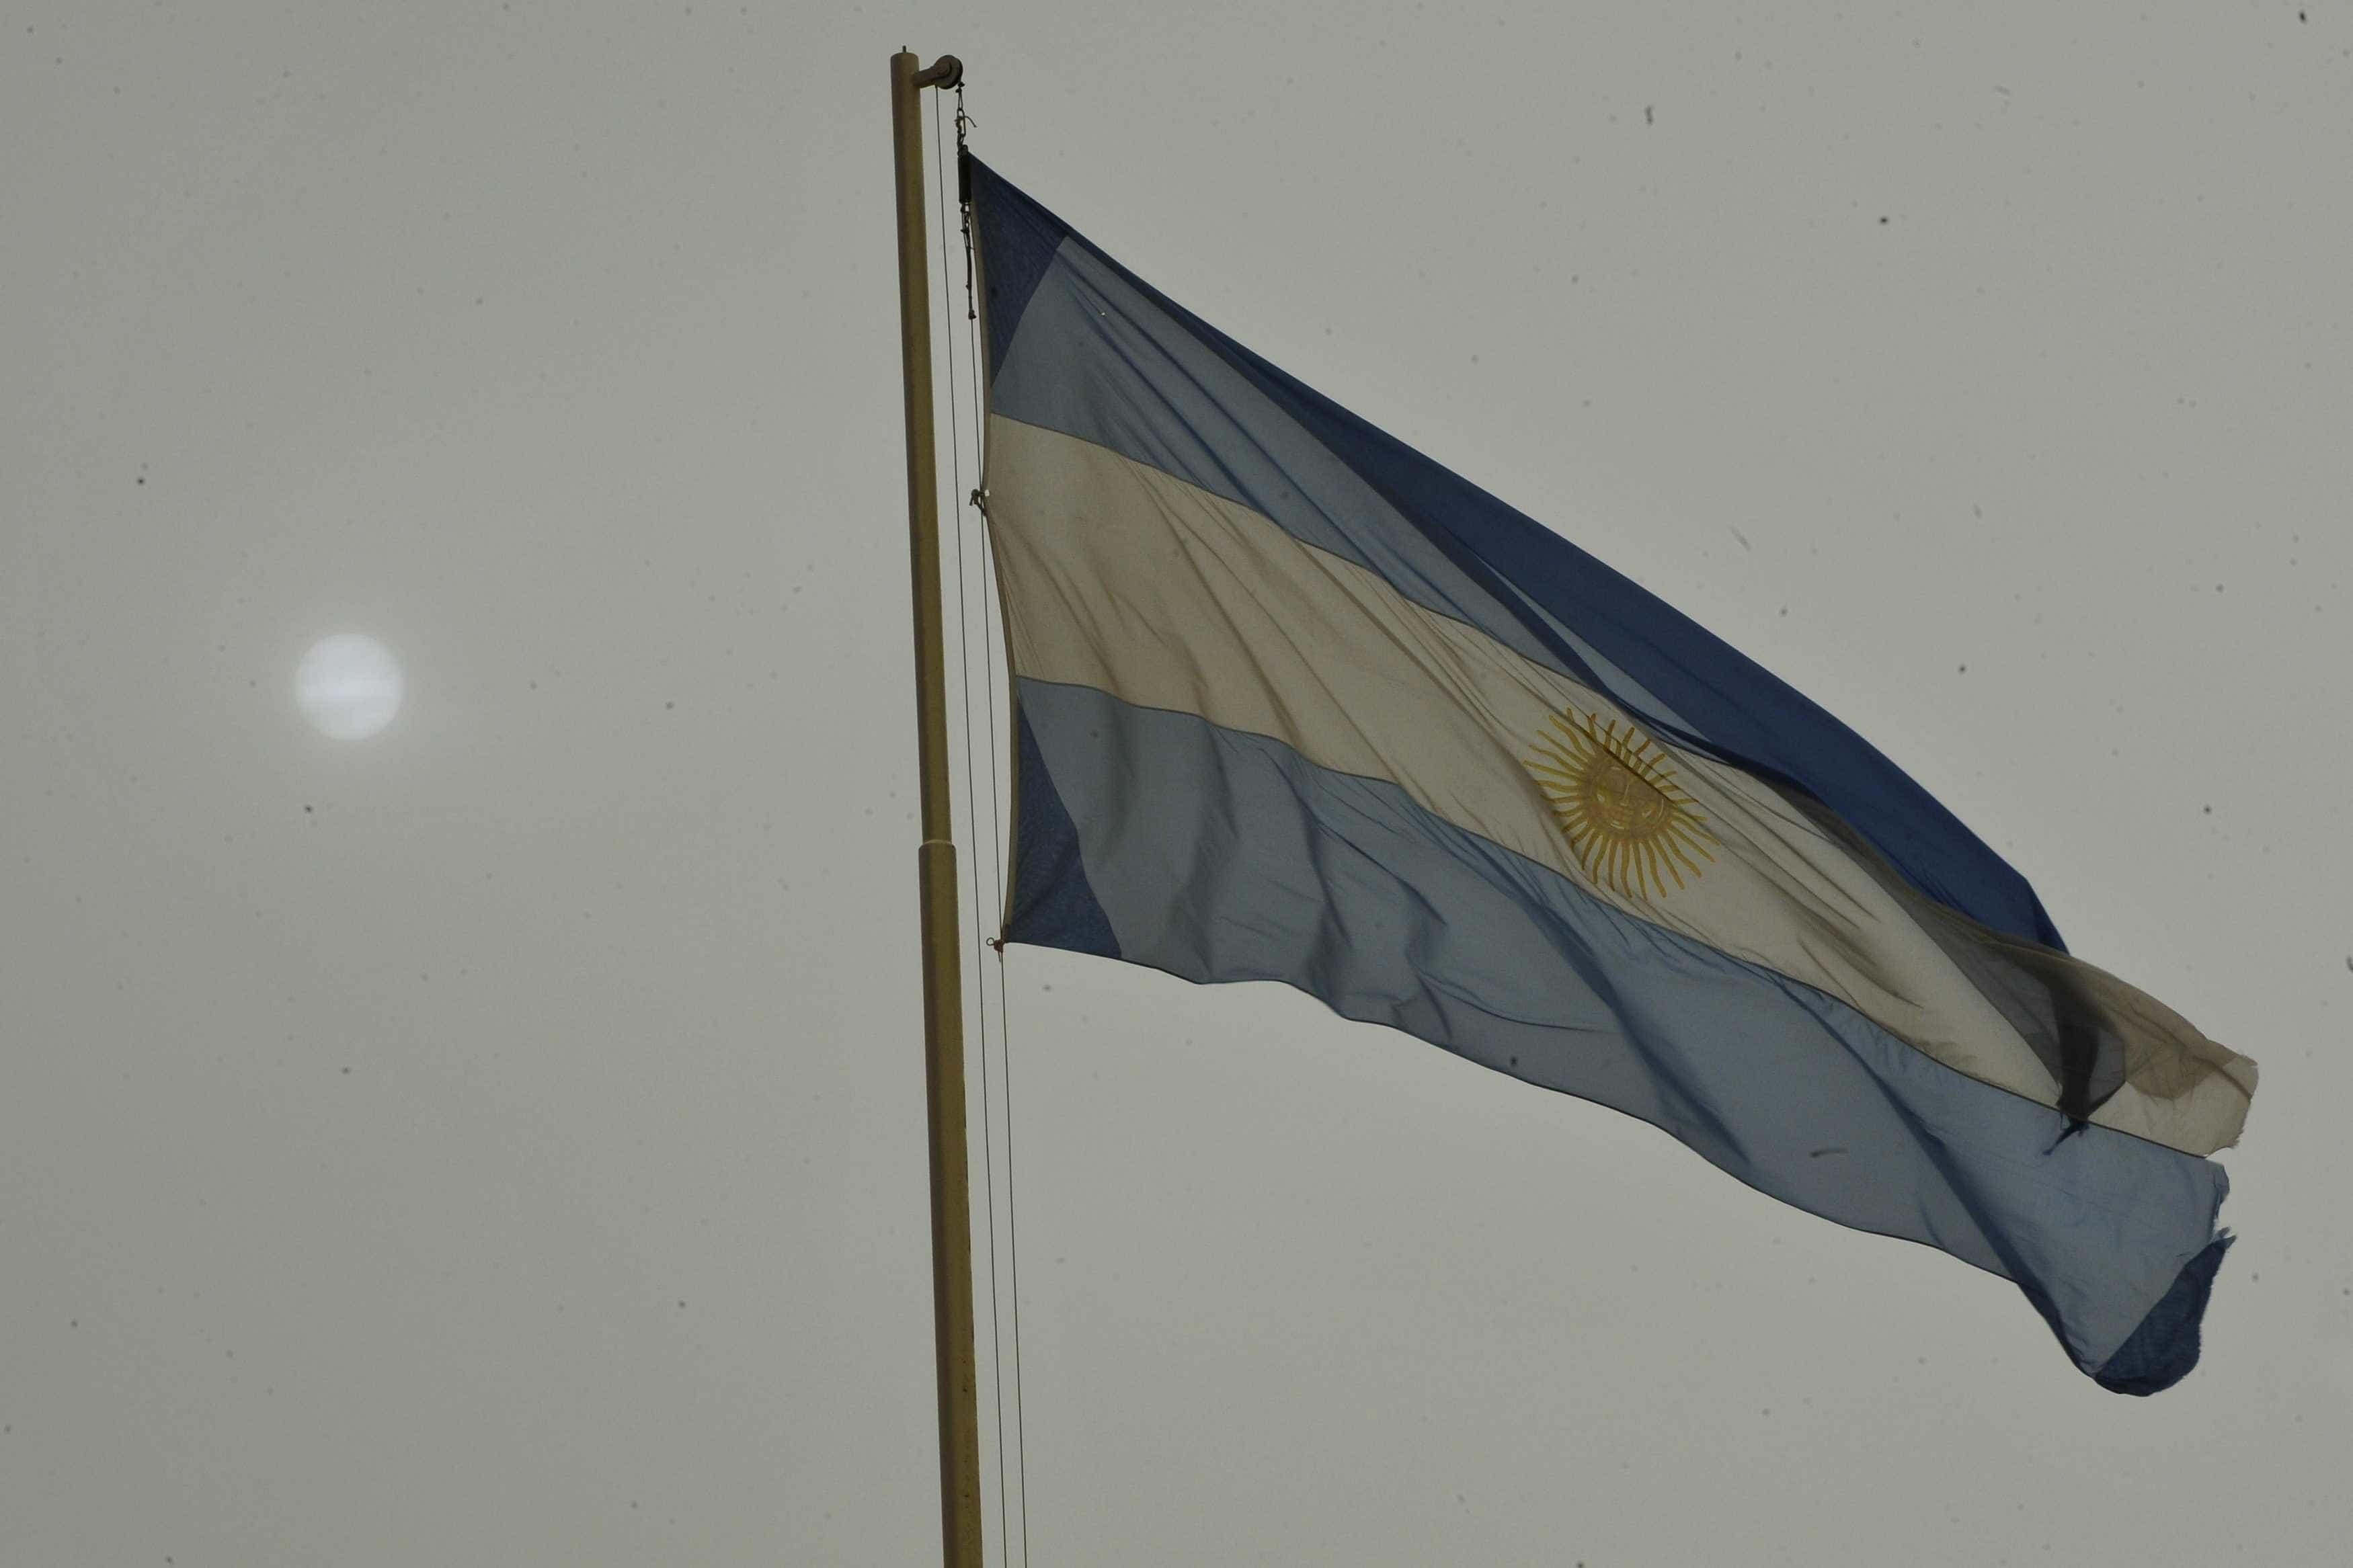 Banco Mundial aprova empréstimos de 950 milhões de dólares à Argentina